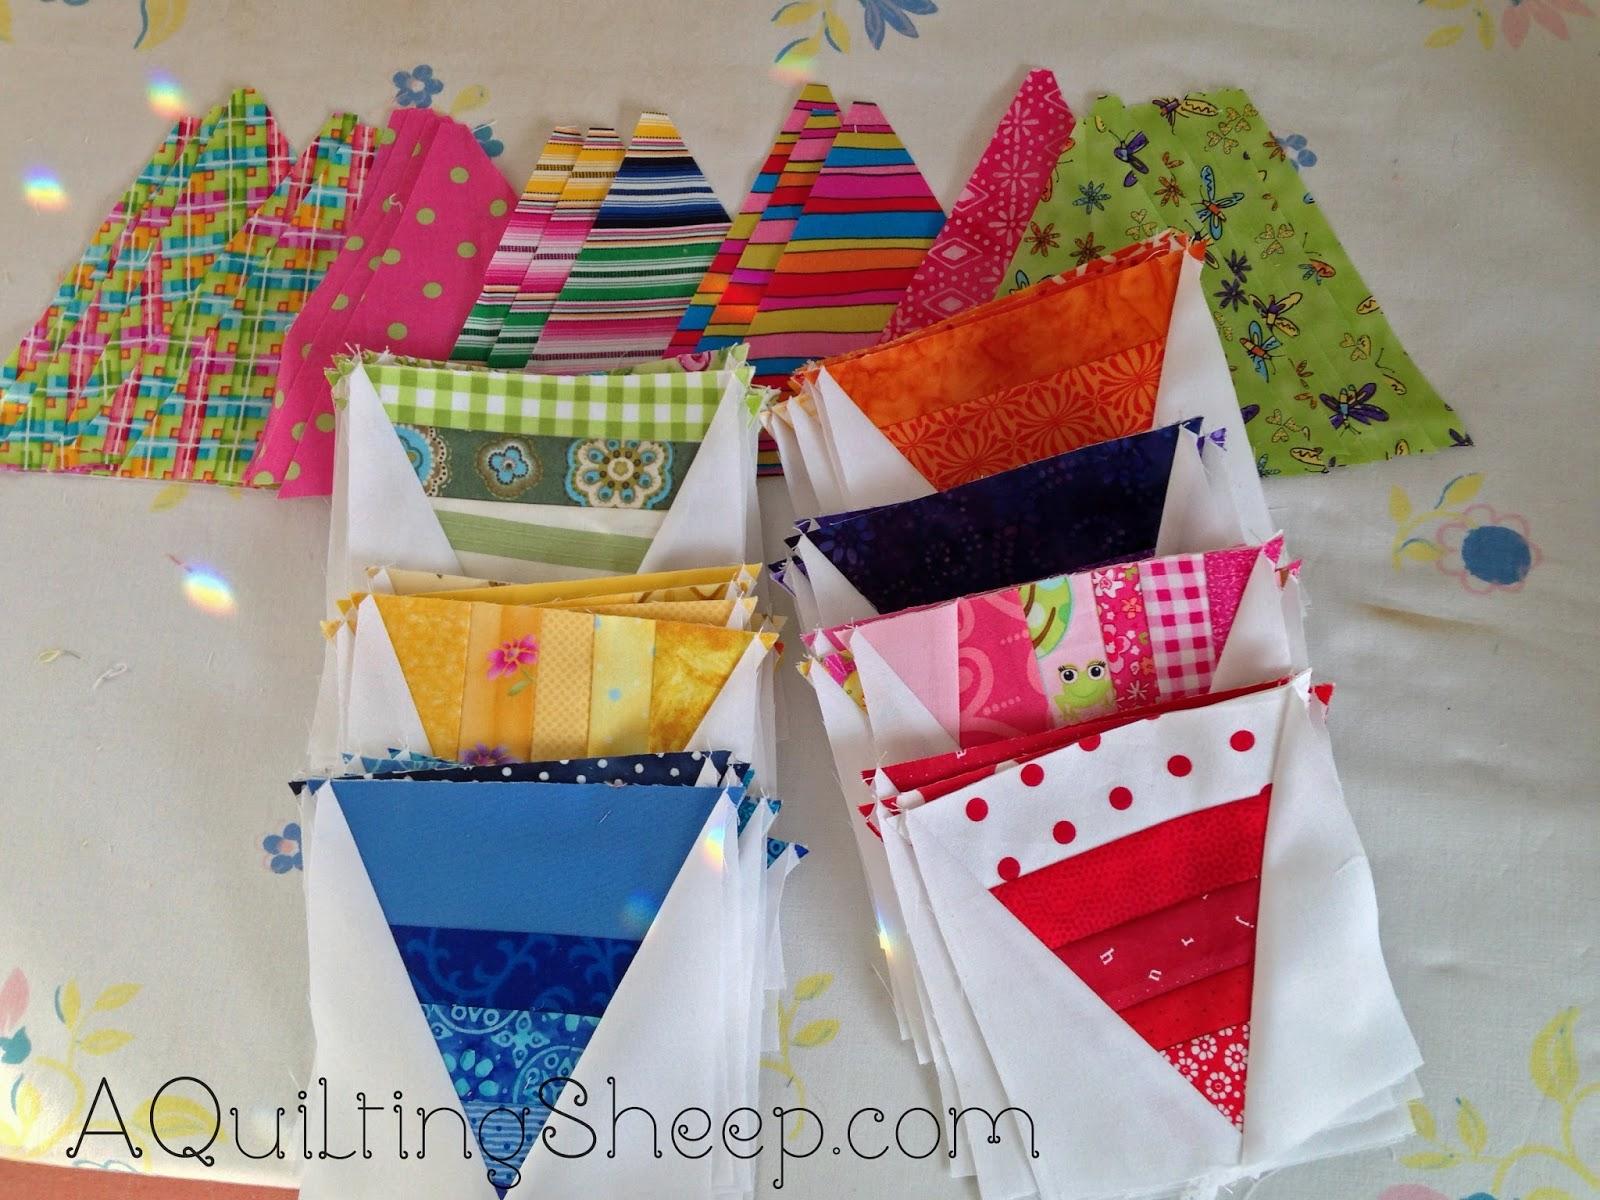 A Quilting Sheep: February 2014 : tri recs quilt patterns - Adamdwight.com